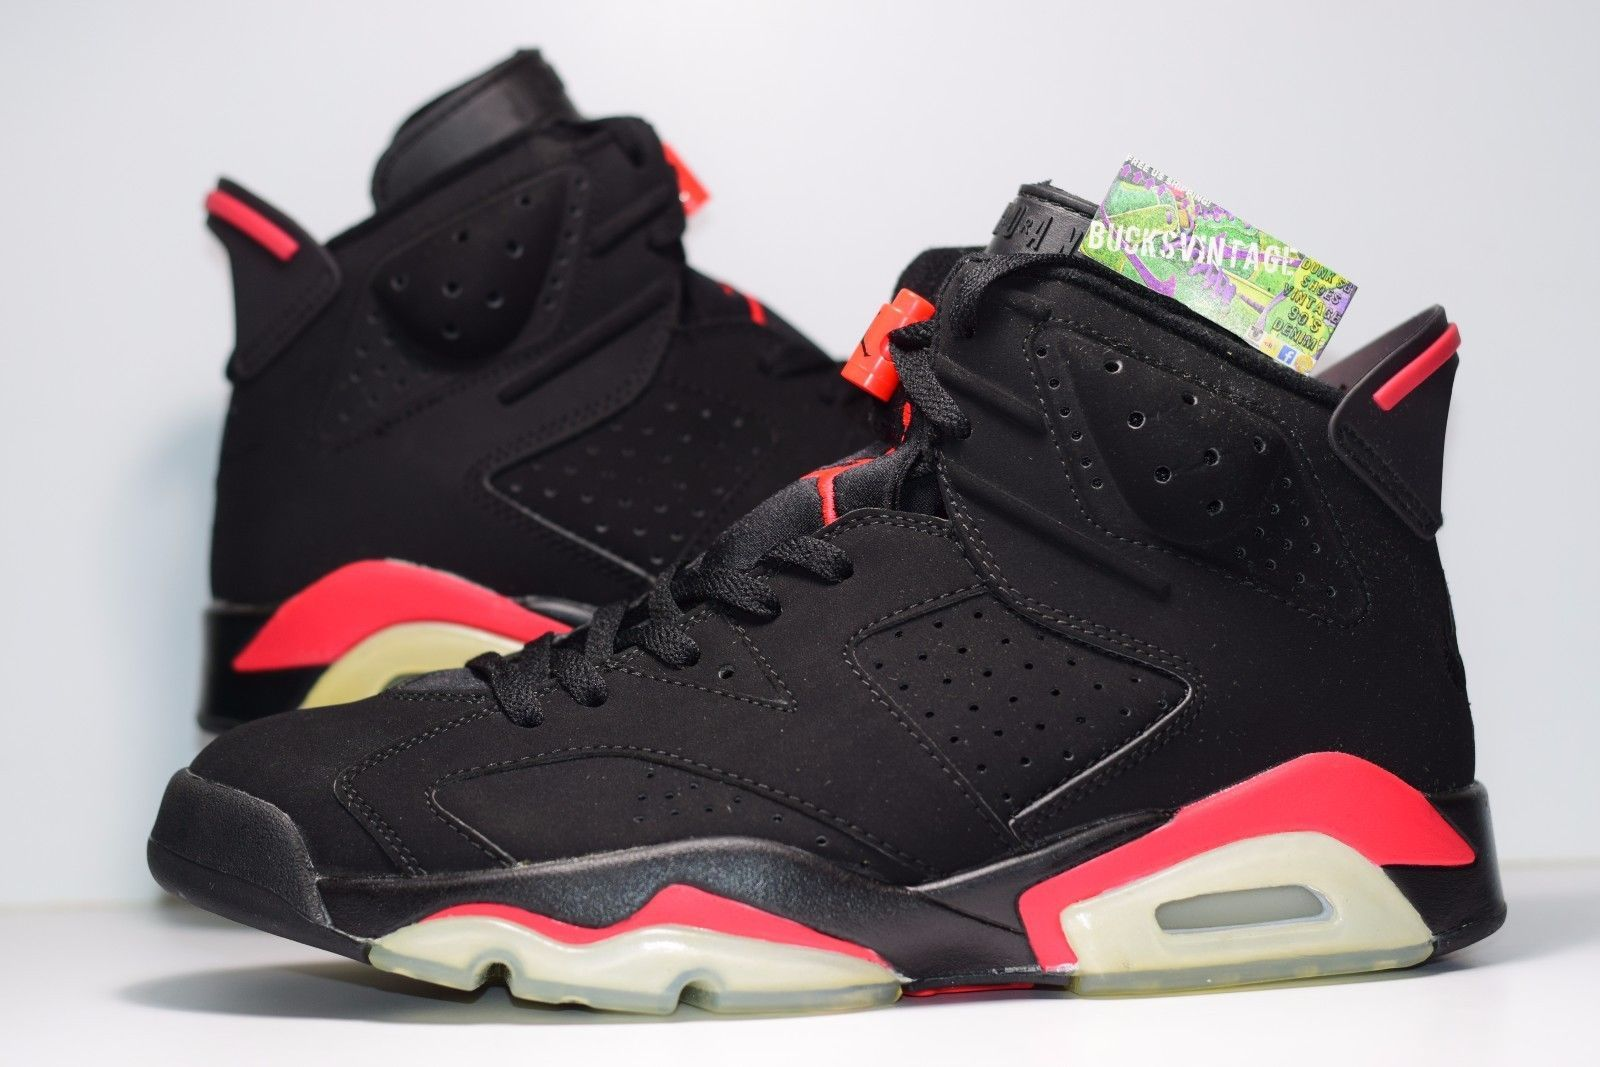 2000 Nike Air Jordan Retro Vi 6 Infrared Og Size 9 Authentic Rare Db 136038 061 Air Jordans Retro Air Jordans Nike Air Jordan Retro